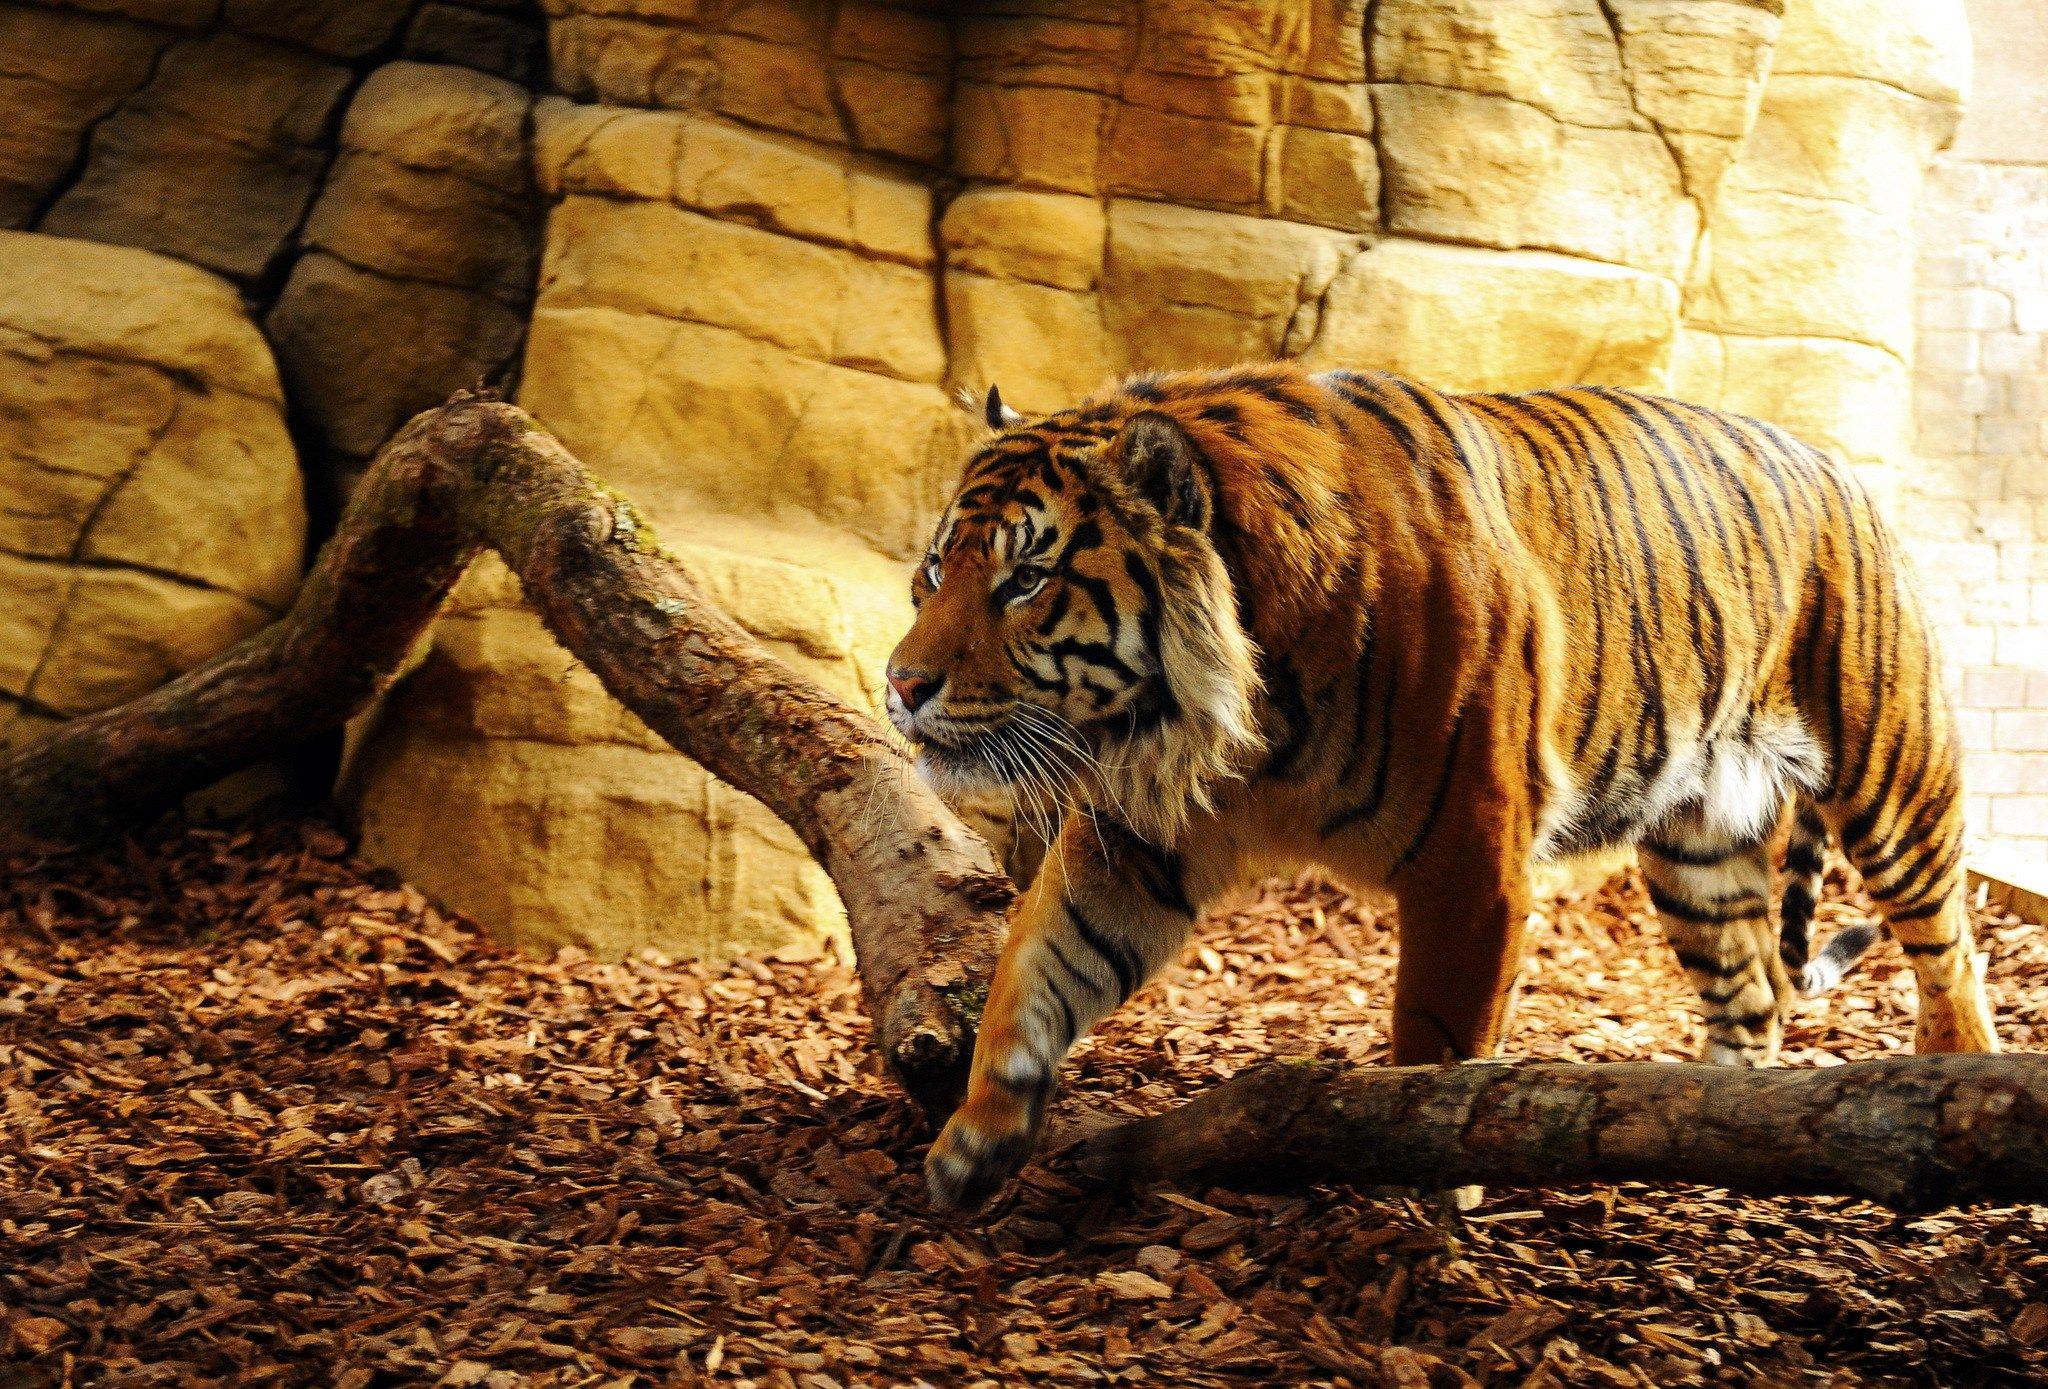 2048x1389px tiger background desktop freedash leapman